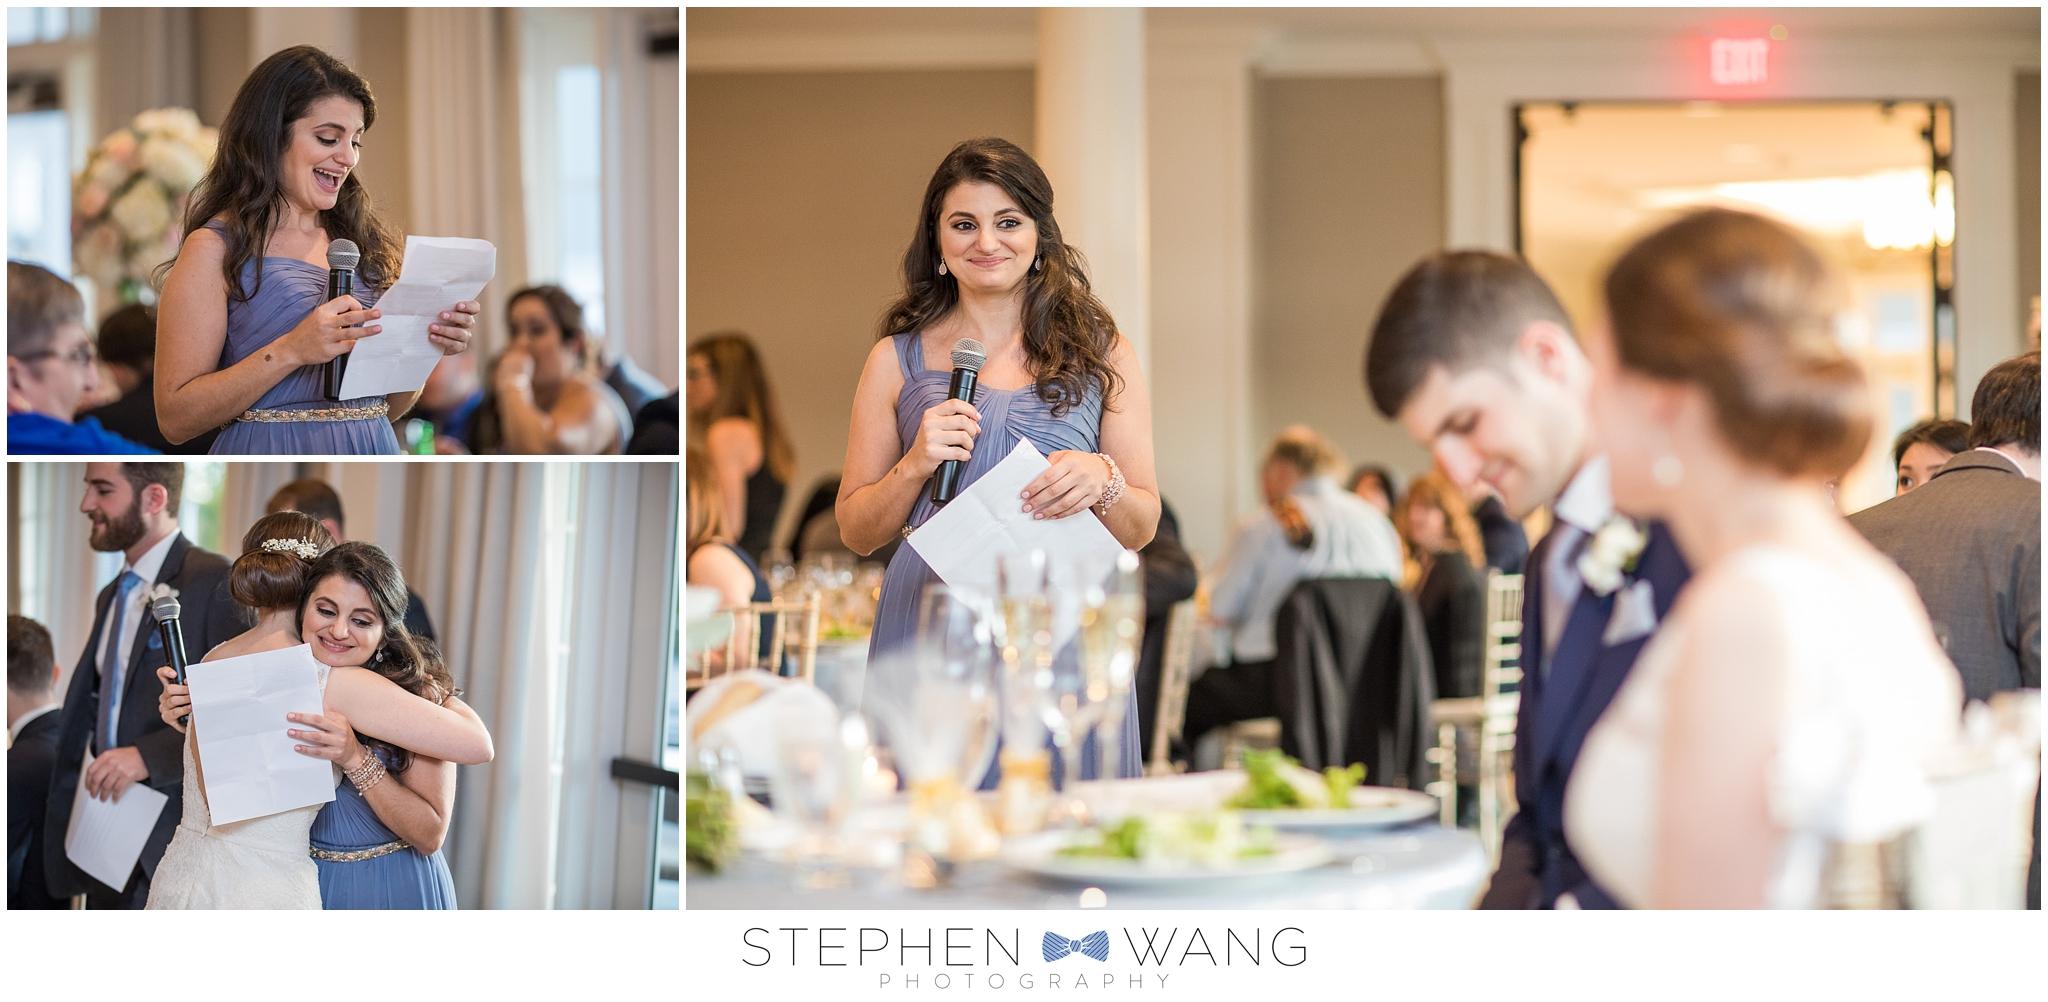 Stephen Wang Photography Shorehaven Norwalk CT Wedding Photographer connecticut shoreline shore haven - 33.jpg